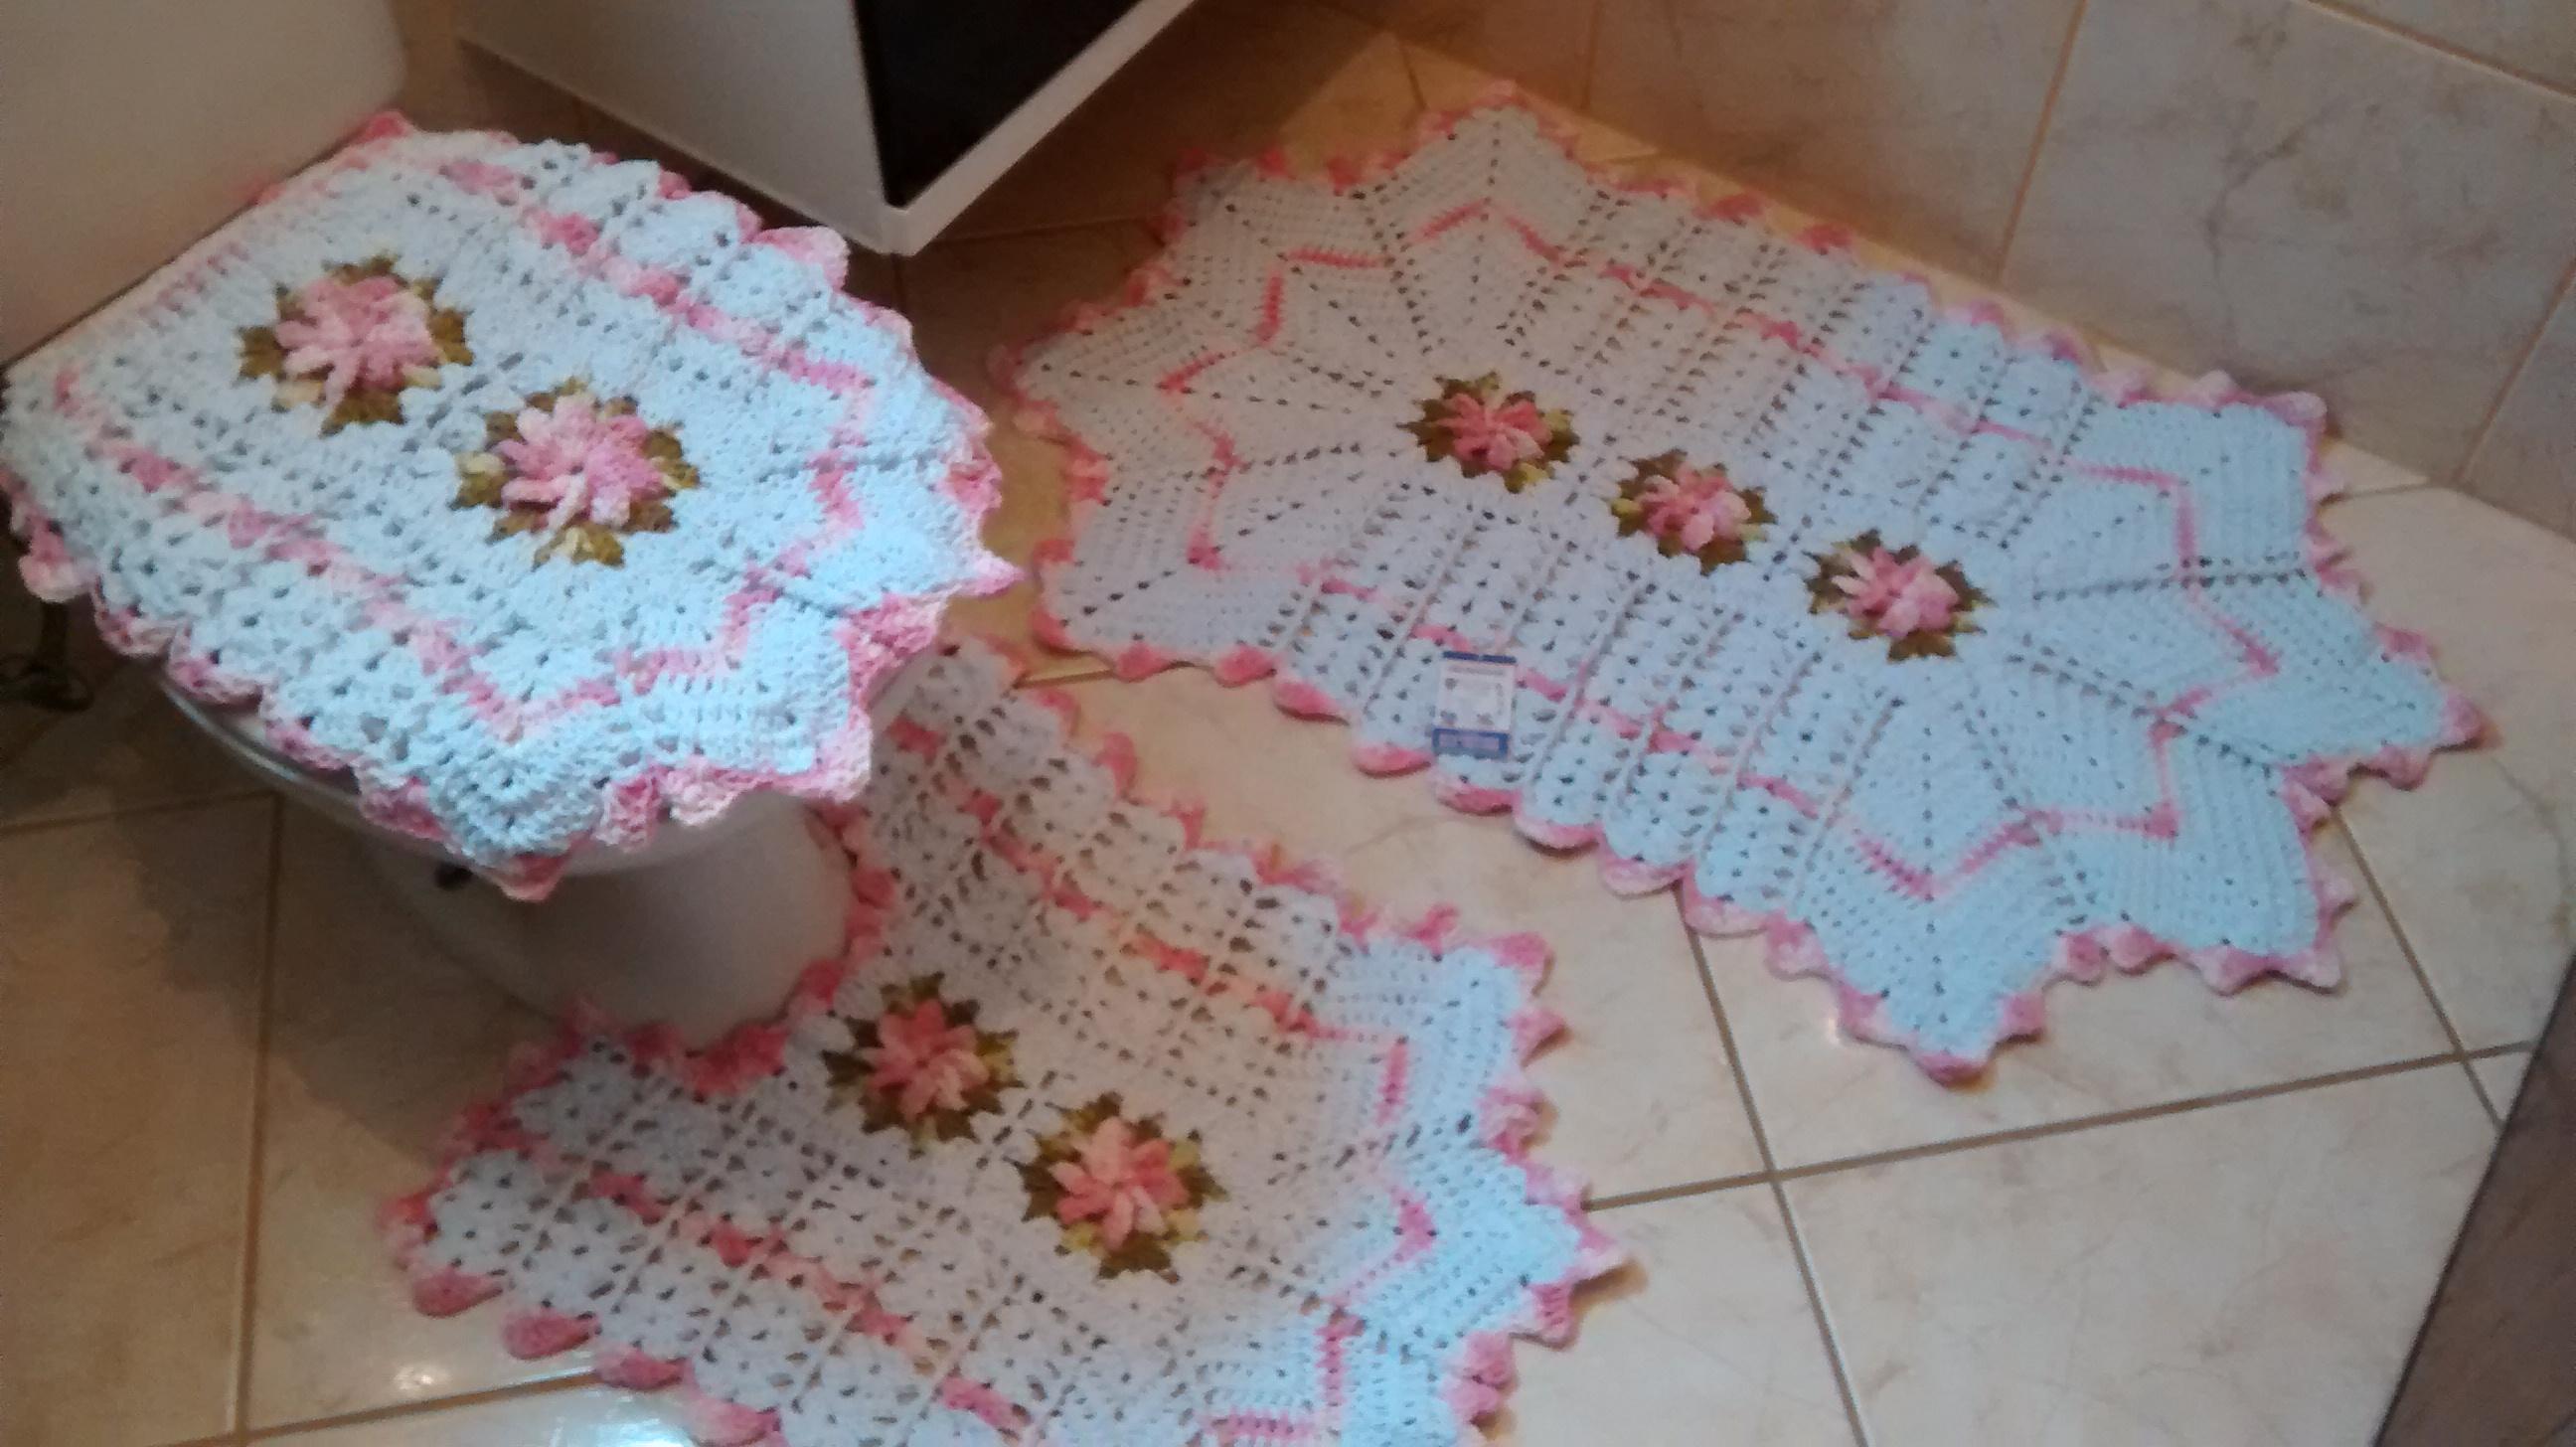 banheiro branco e rosa bebe tapete de barbante jg de banheiro branco e  #3C6D8F 2592x1456 Banheiro Branco E Rosa